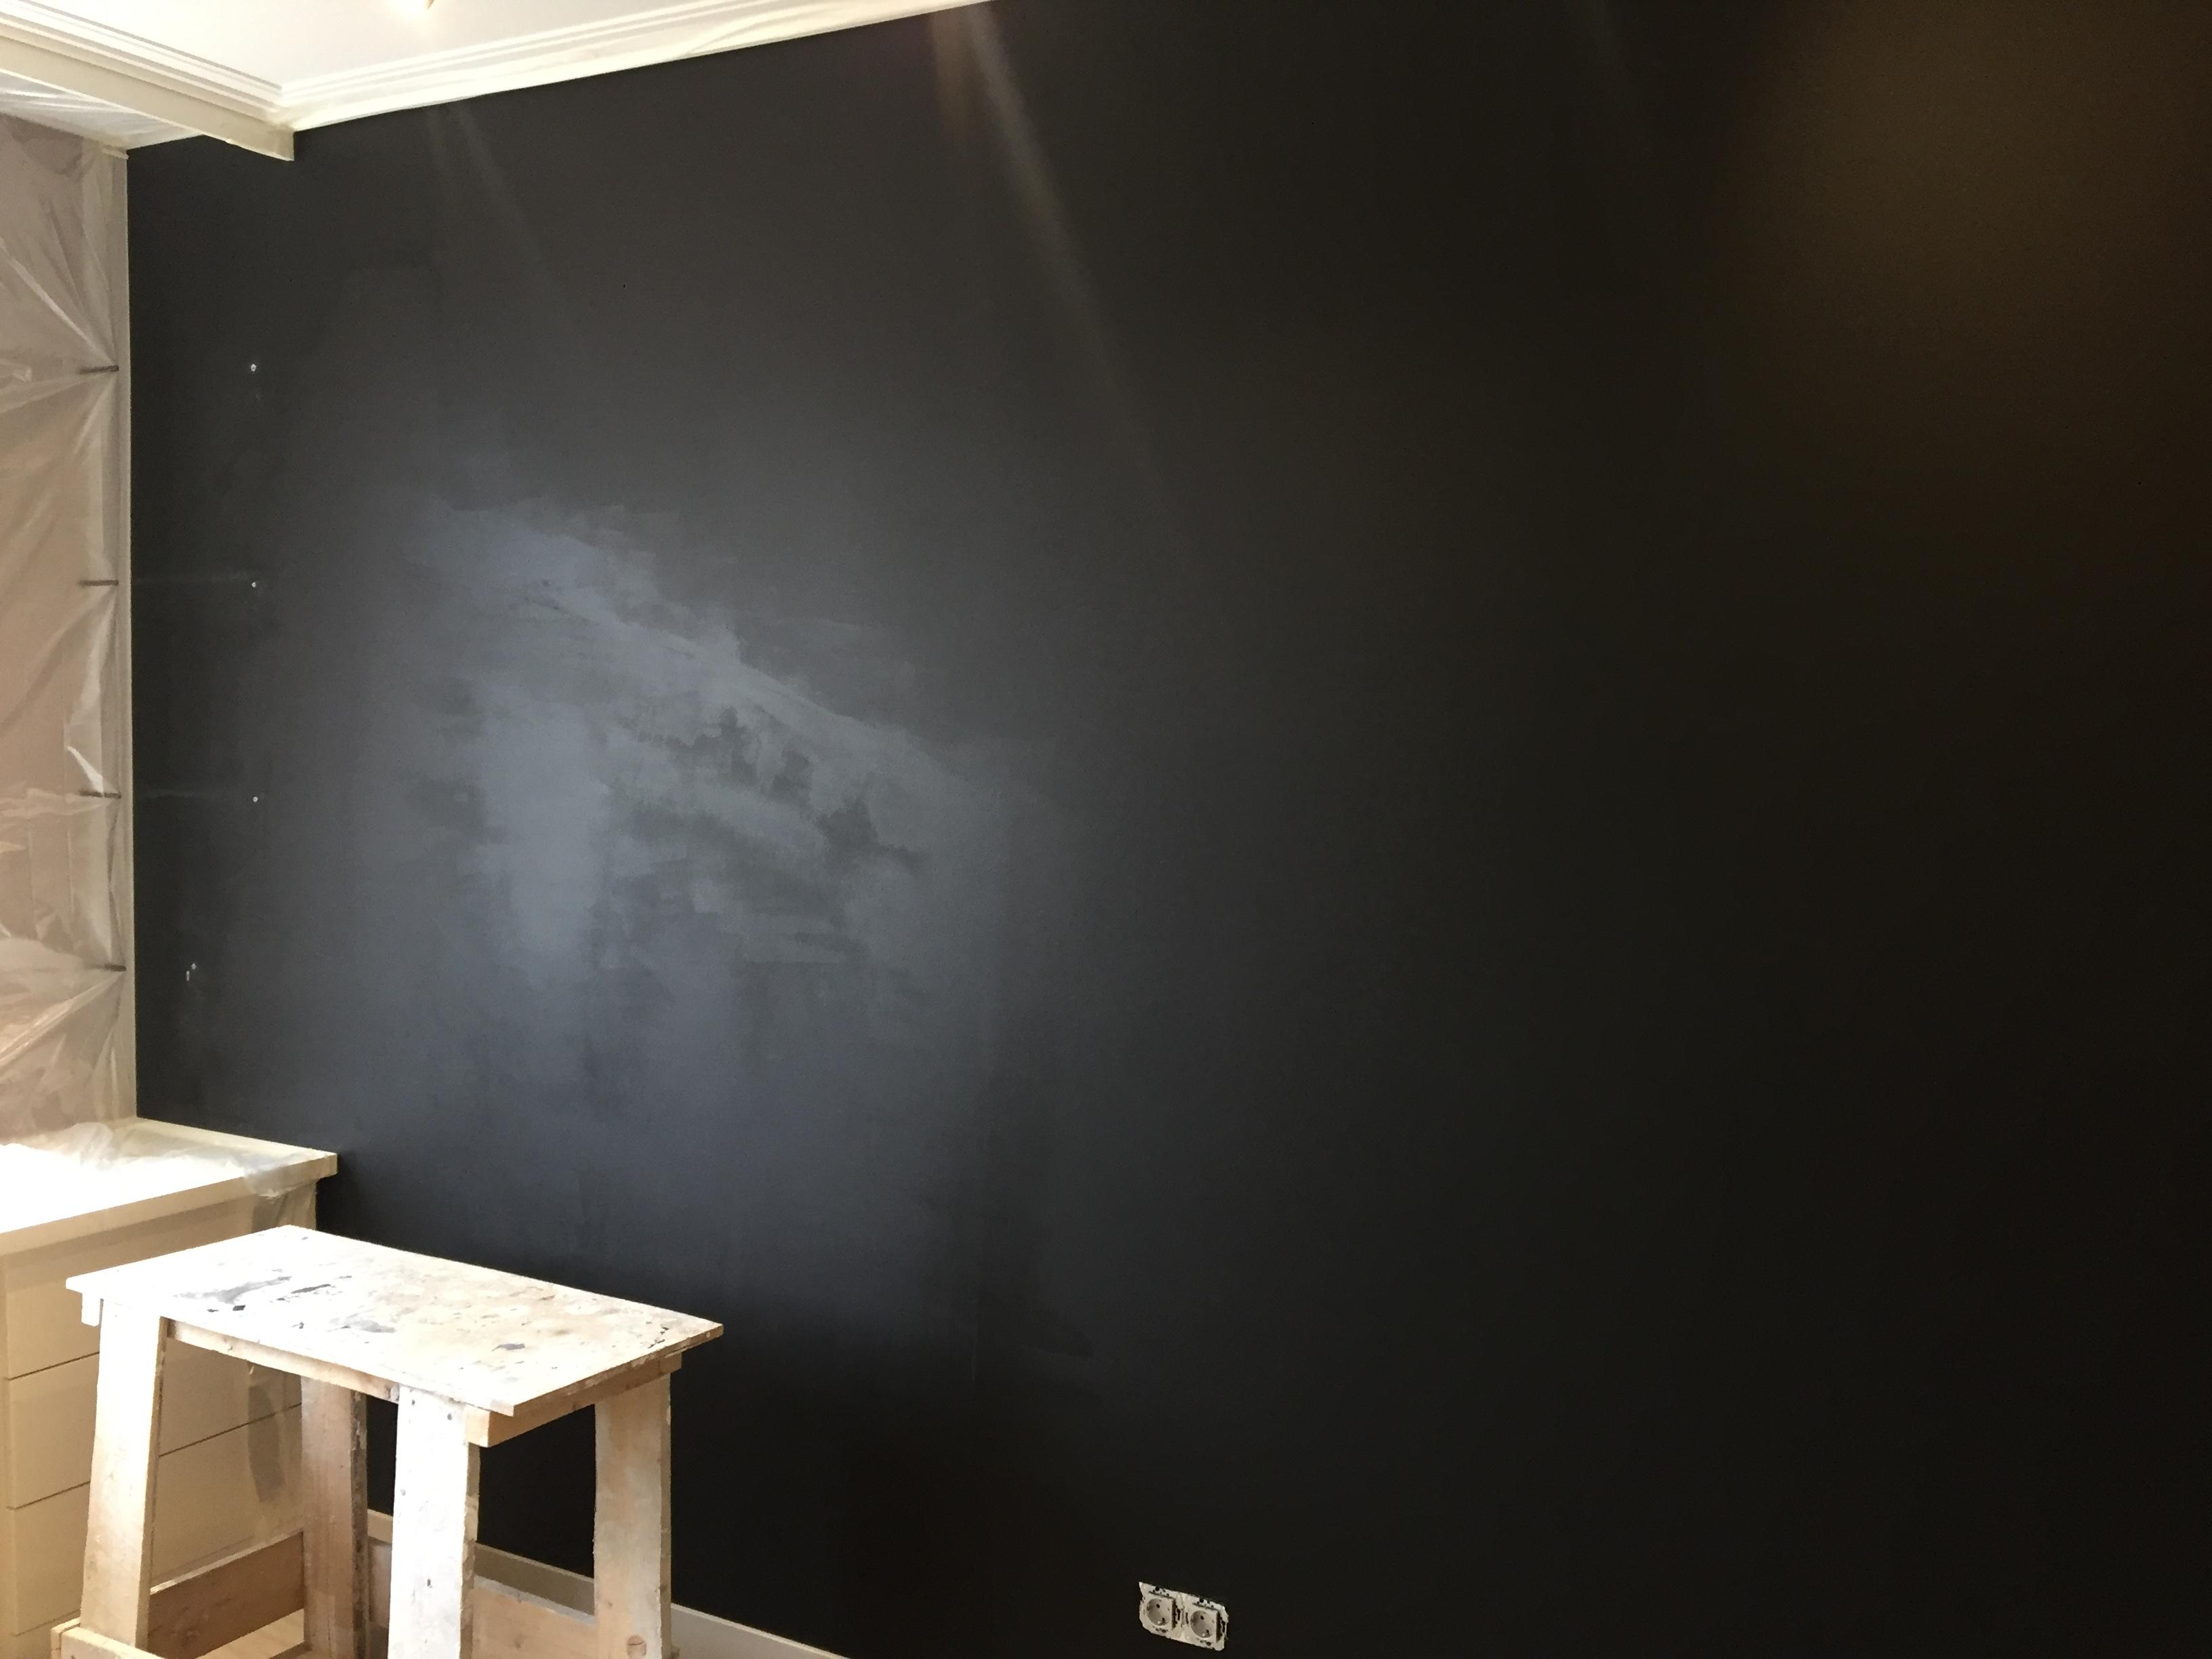 Испорченная грифельная стена